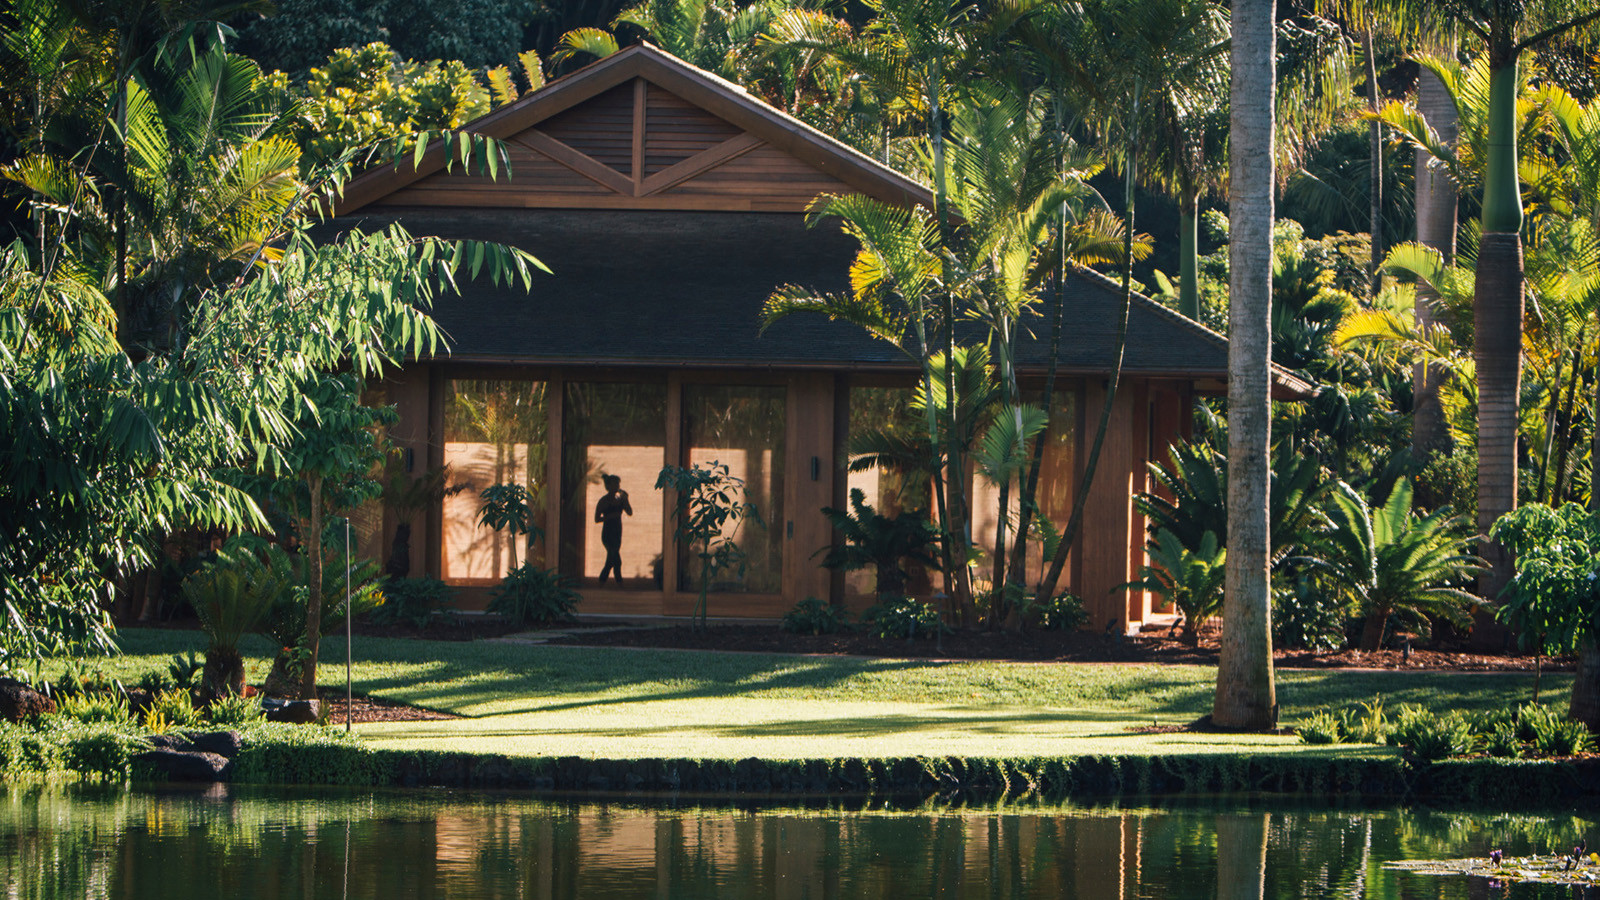 news-main-sensei-sabbatical-at-four-seasons-resort-lanai.1610211302.jpg